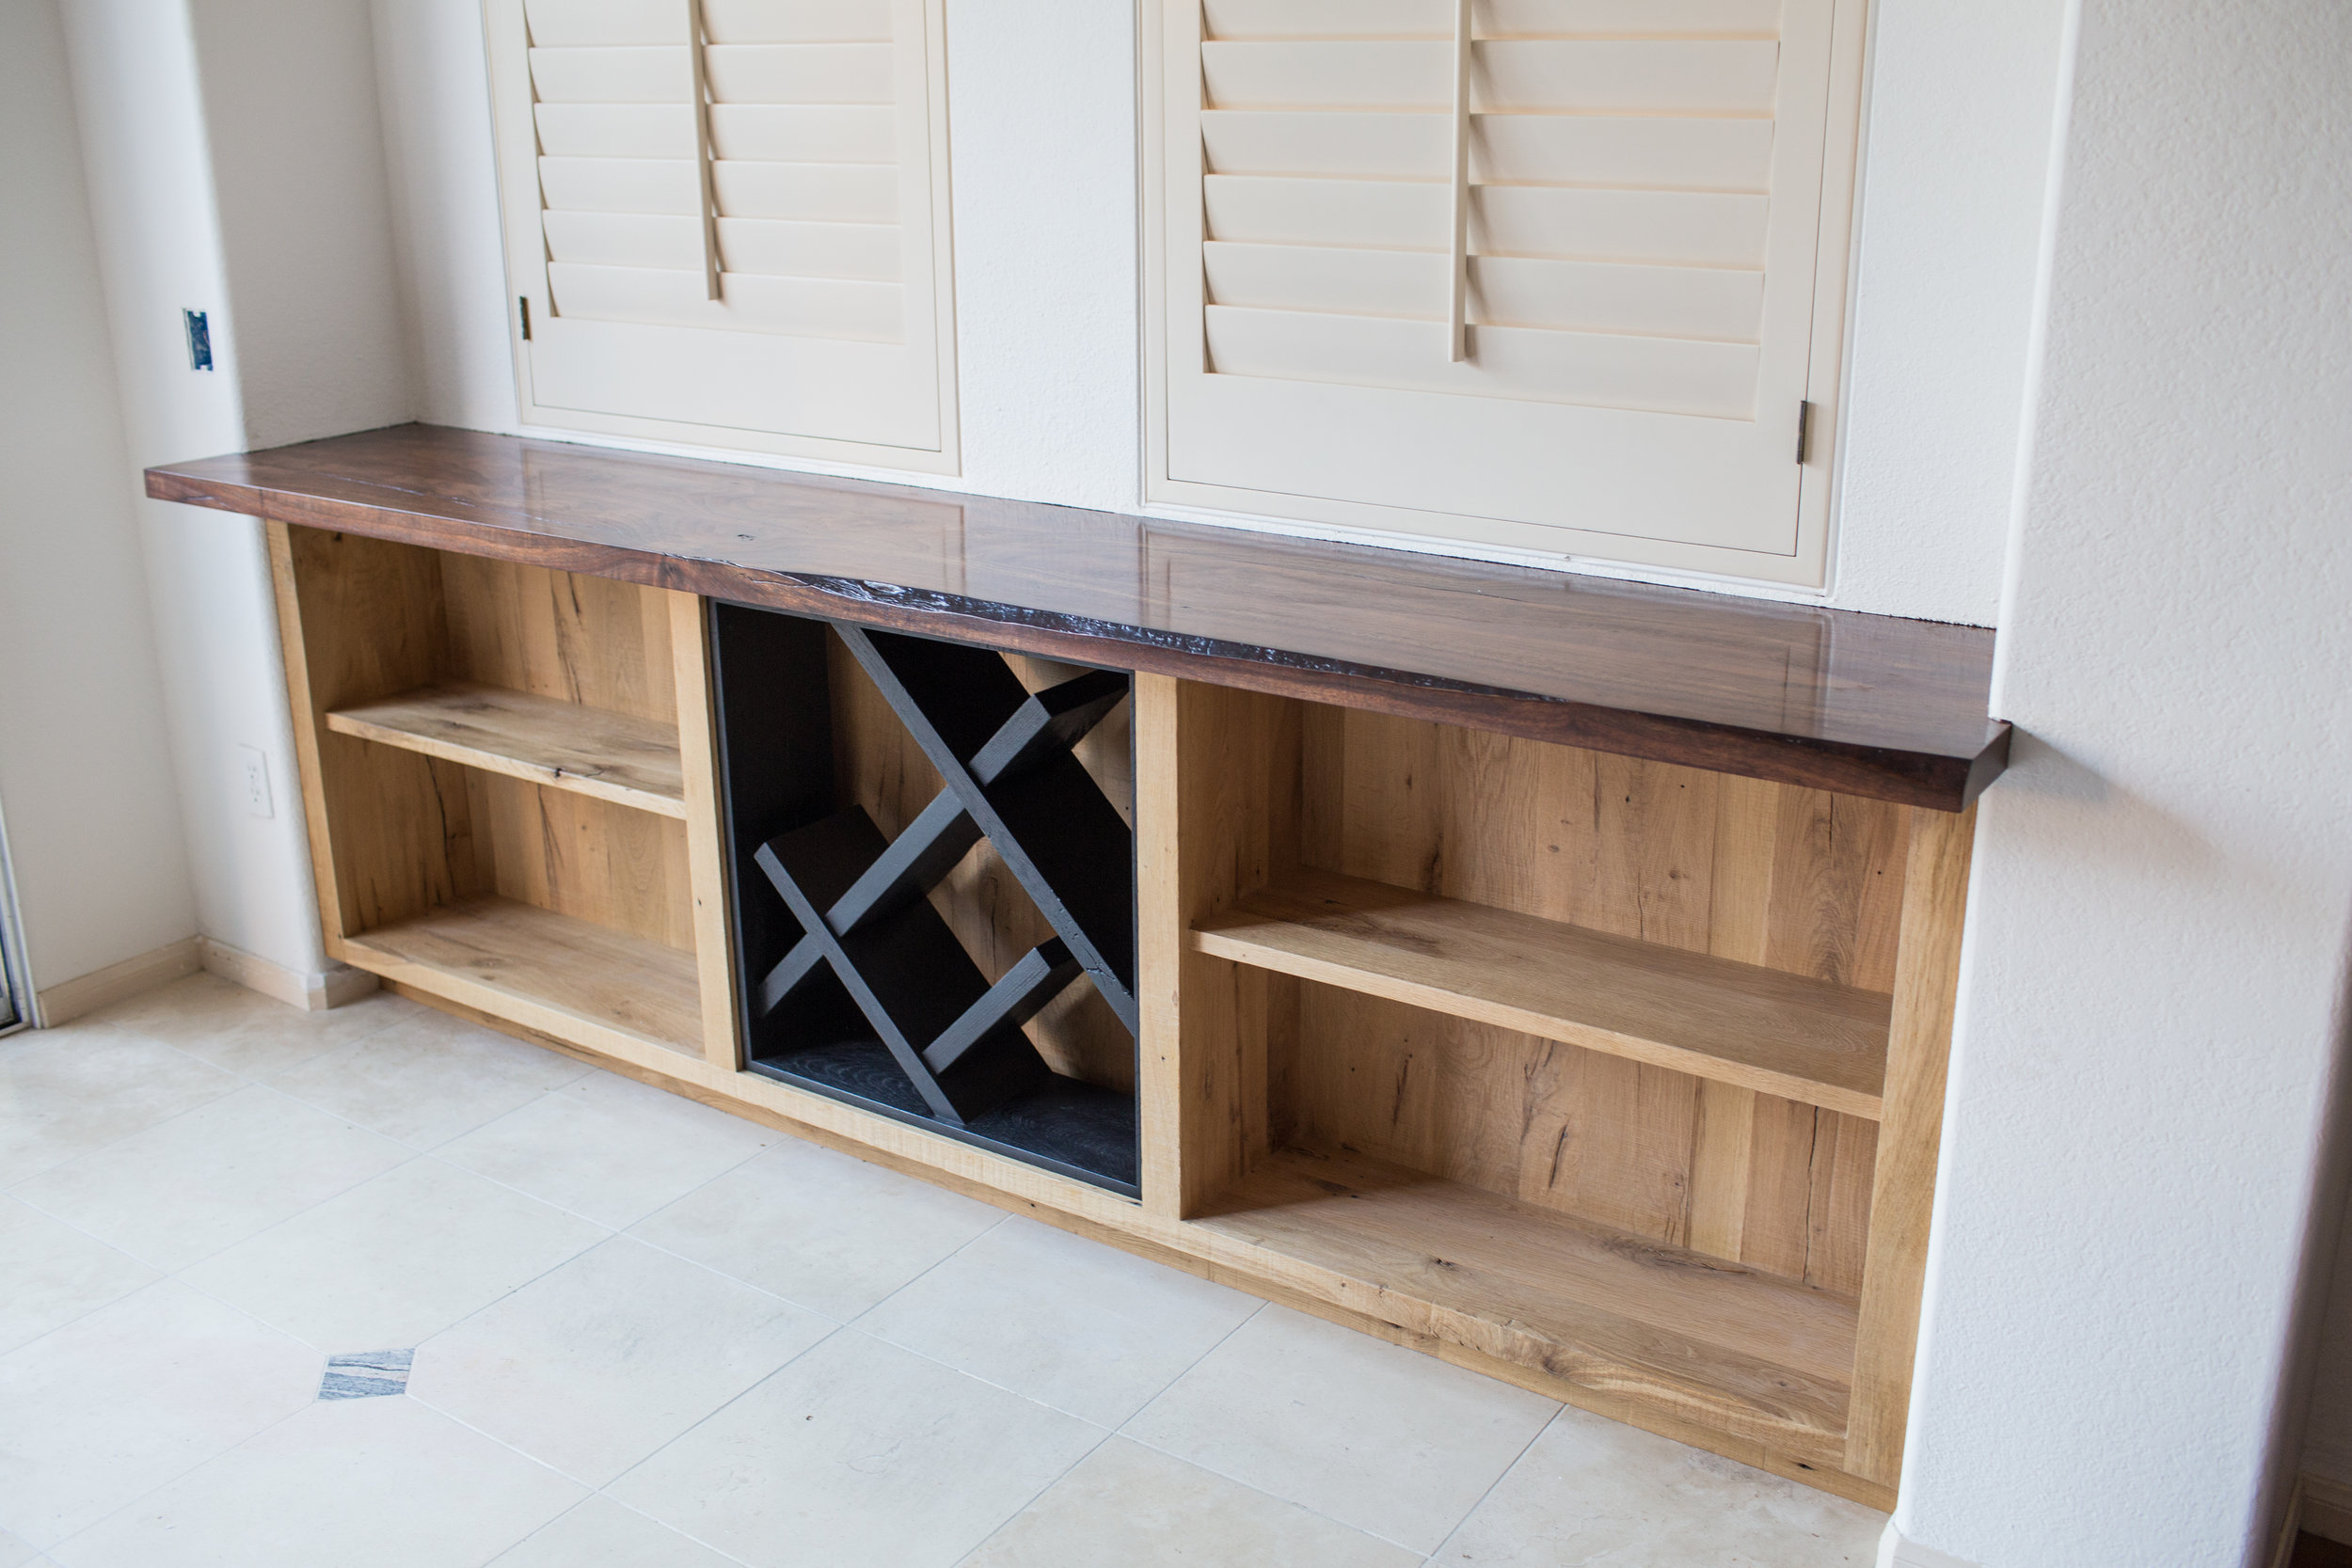 ben-riddering-custom-kitchen